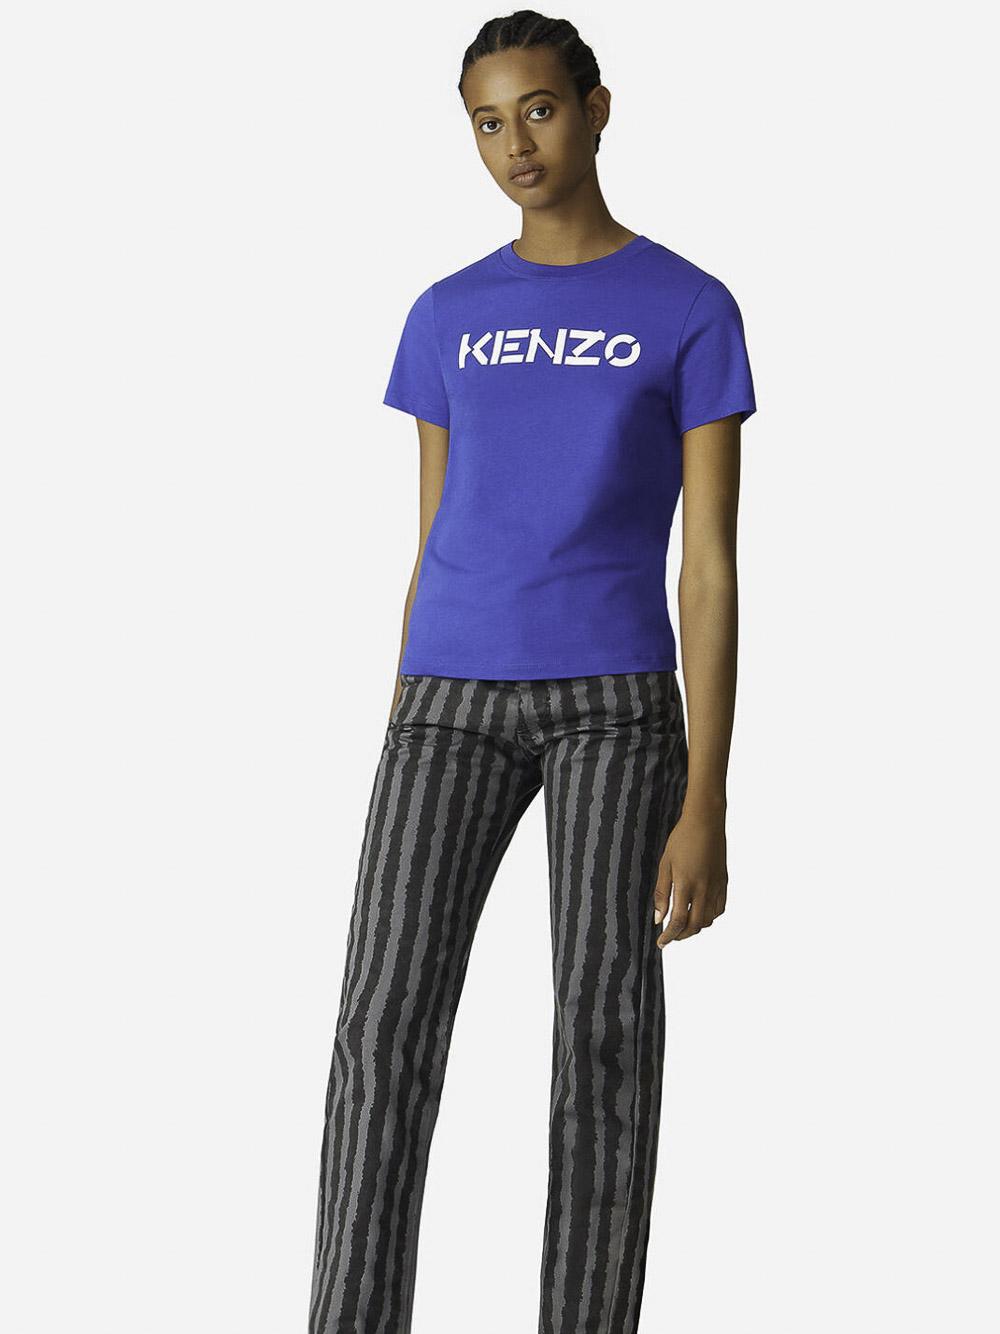 KENZO Μπλούζα t-shirt 2TS8414SJ-71 ΗΛΕΚΤΡΙΚ